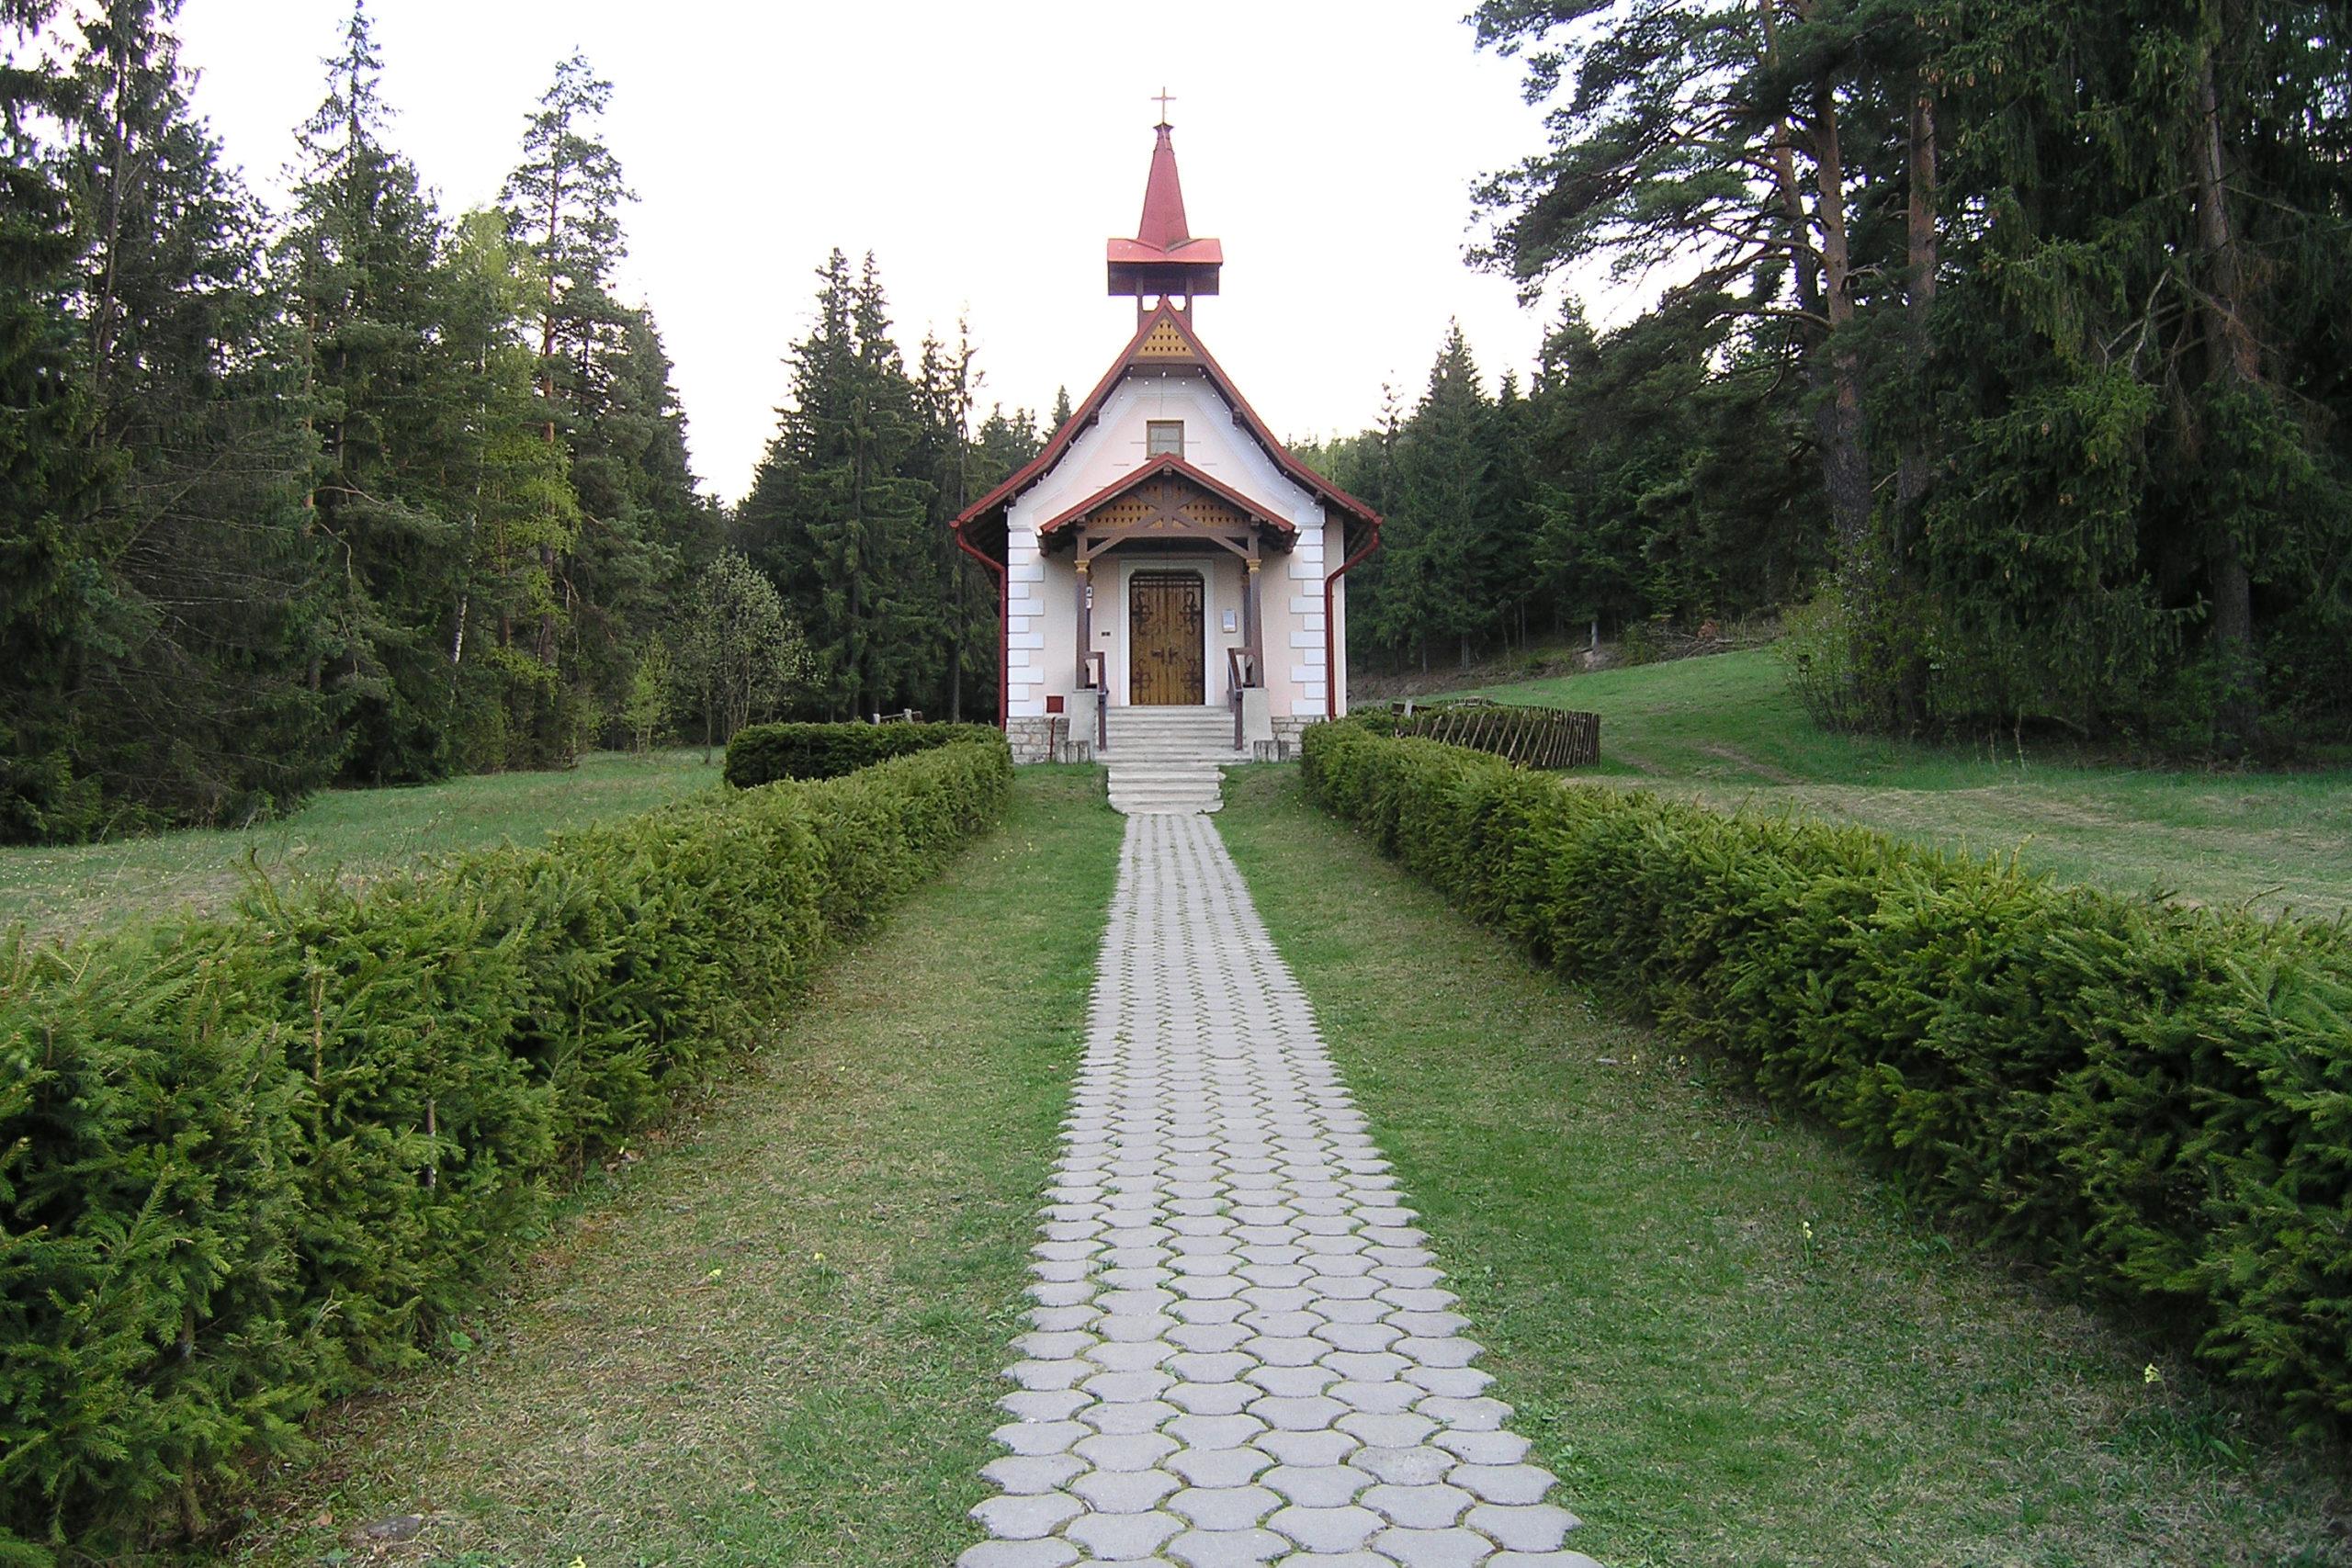 Kaplica w lesie